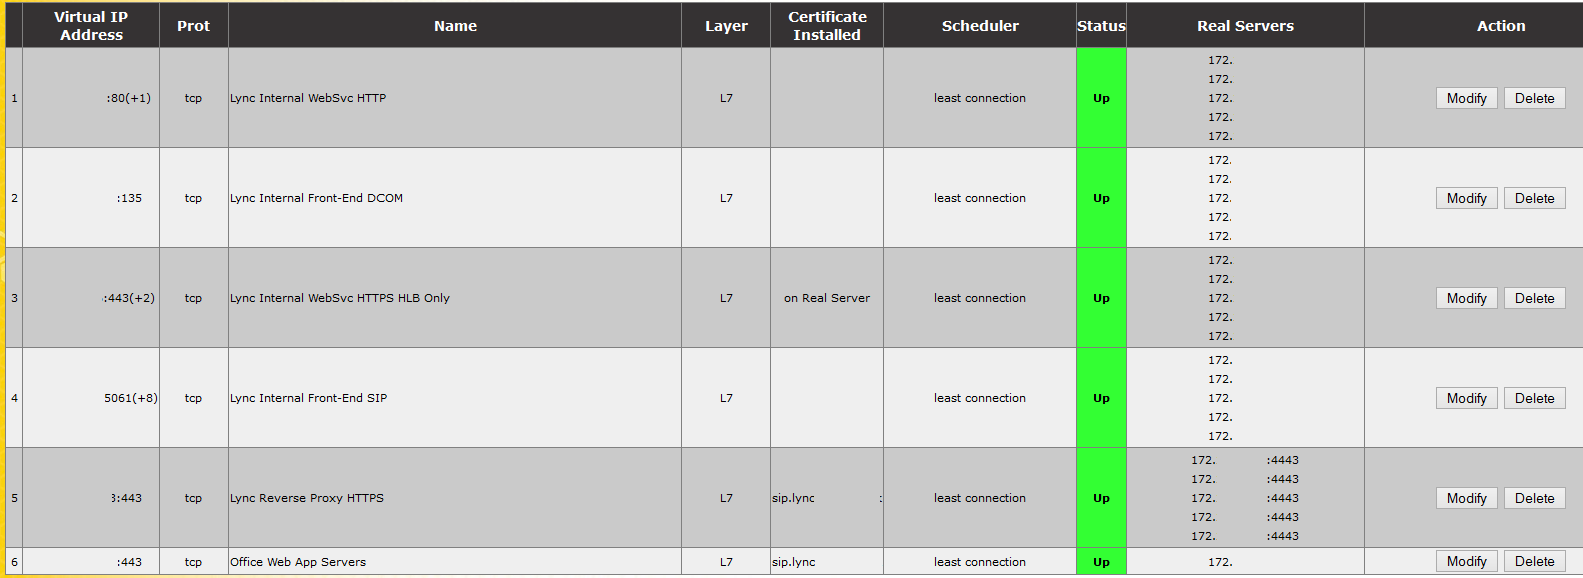 Set up Two-Armed Kemp VLM as Reverse Proxy/HLB for Lync 2013